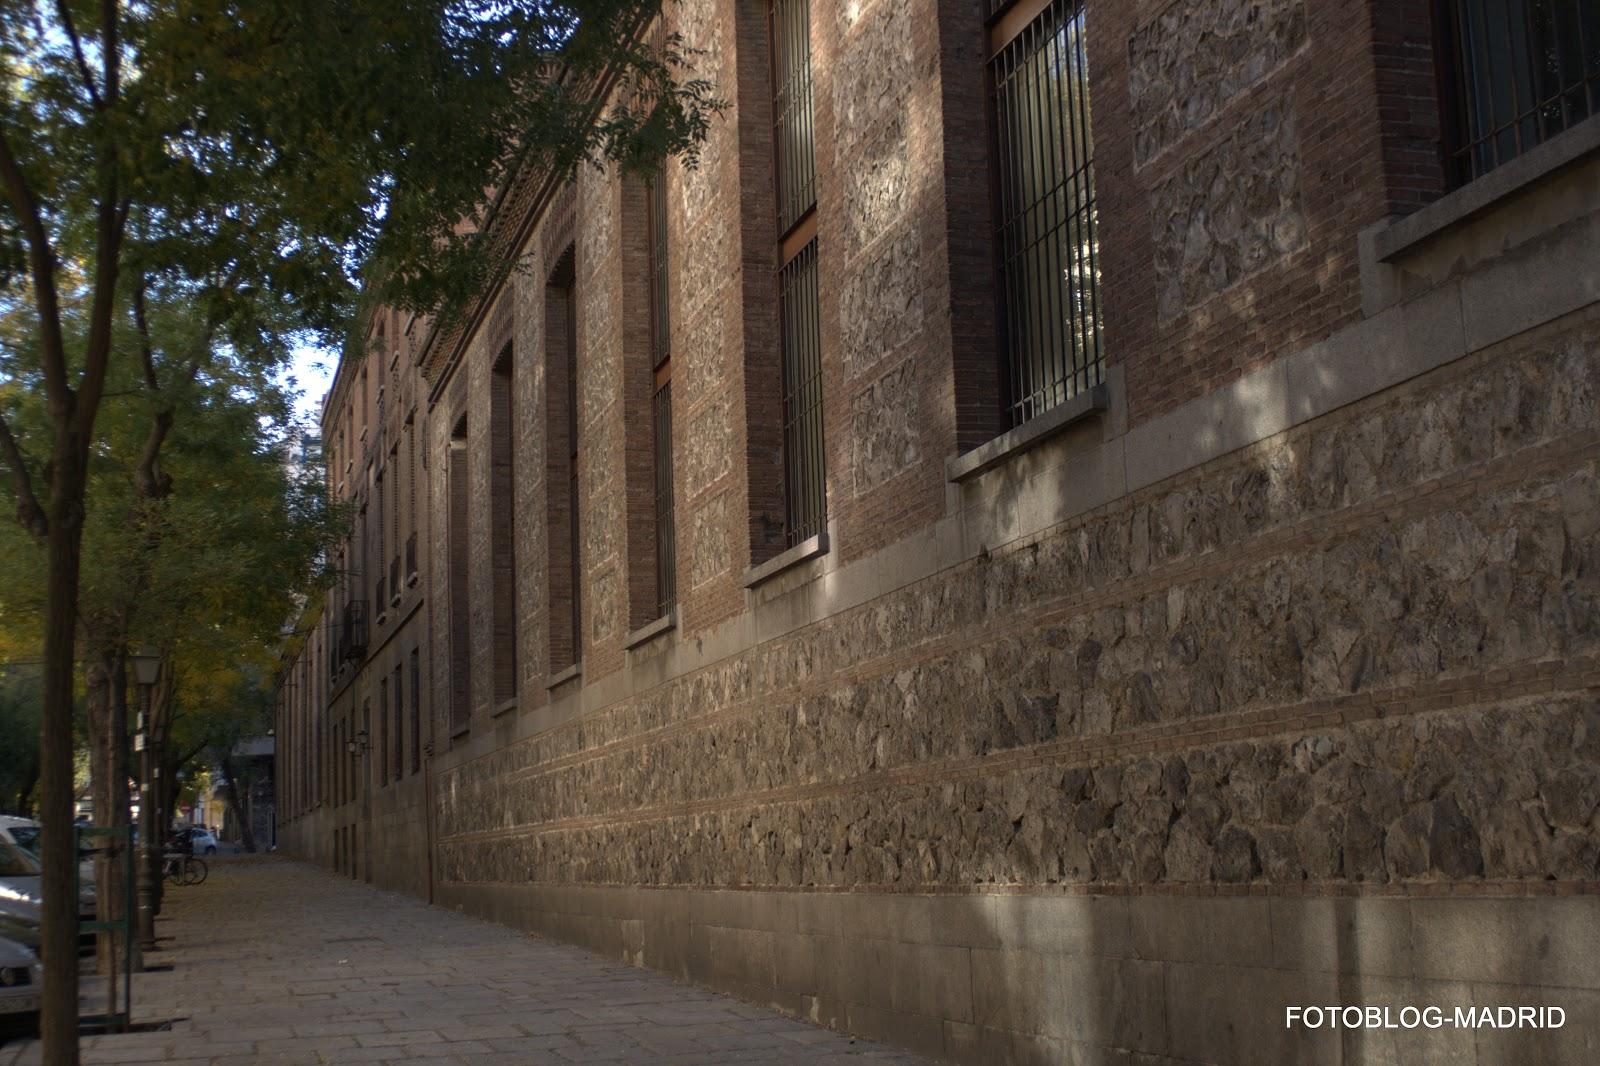 Fotoblog madrid real fabrica de tapices - Tapiceros madrid ...